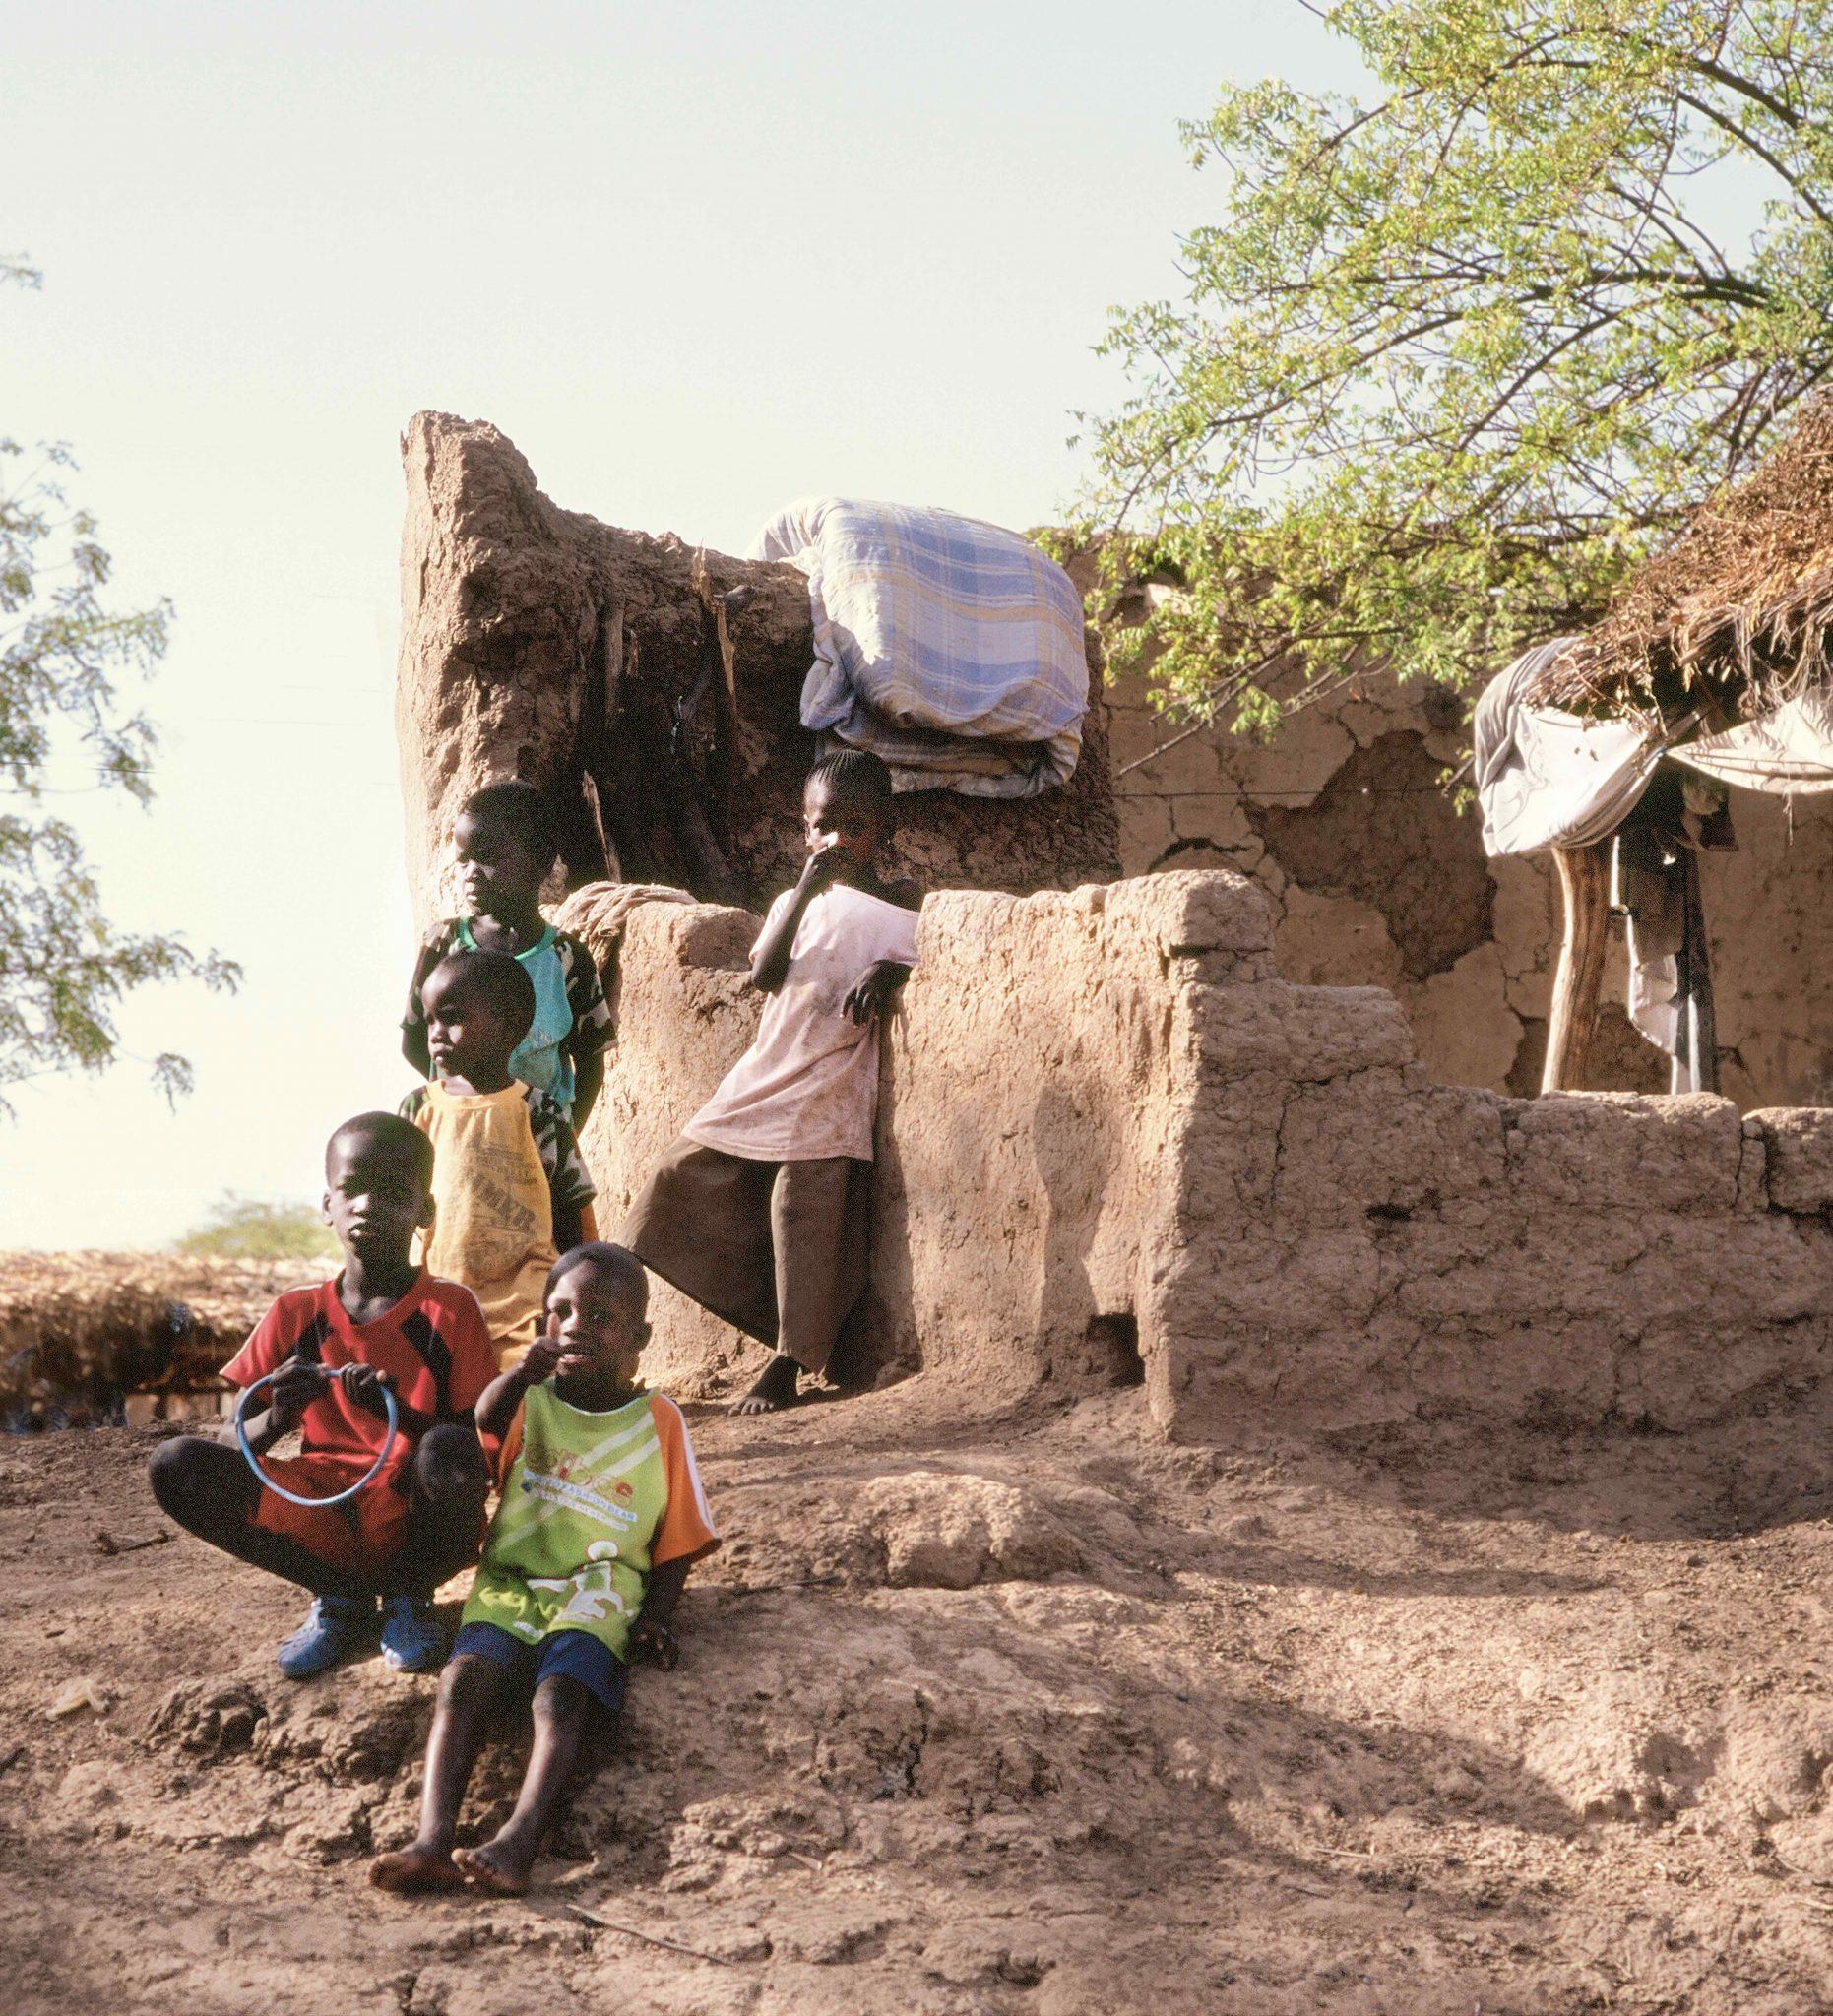 Five Children, Raphael, Senegal